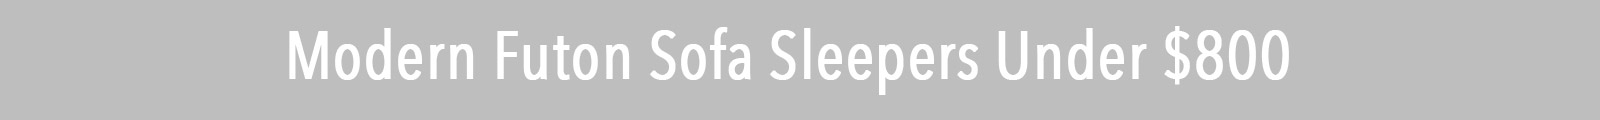 Modern Futon Sofa Sleepers Under $800